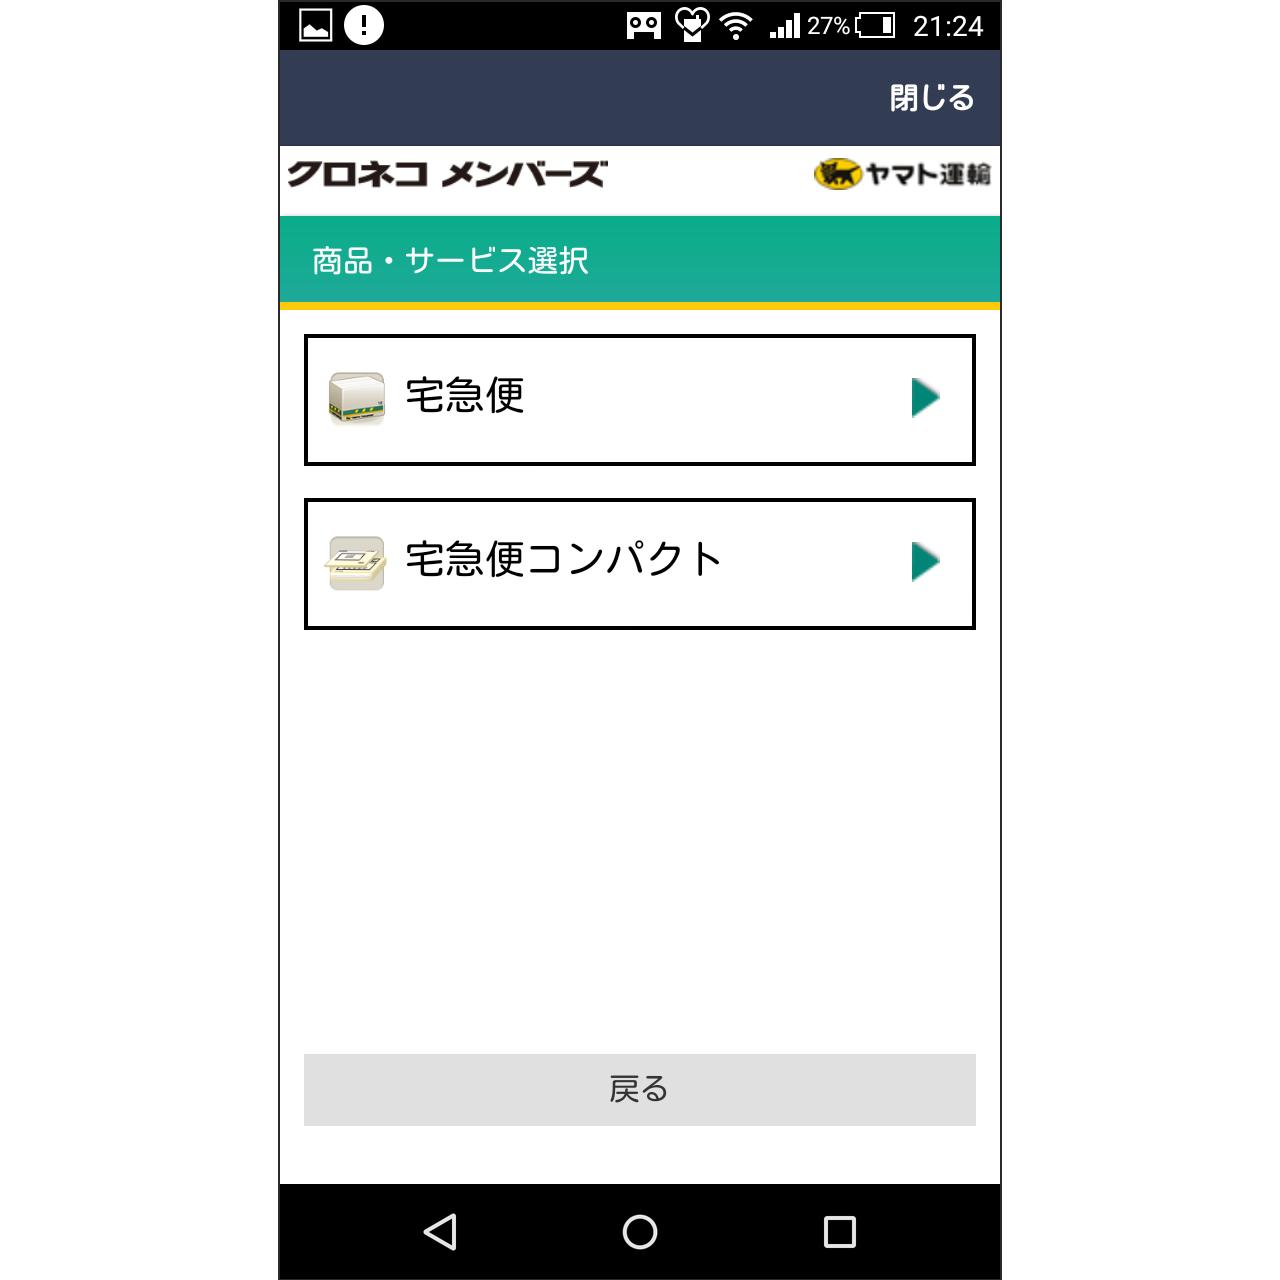 screenshot_2016-09-09-21-24-07